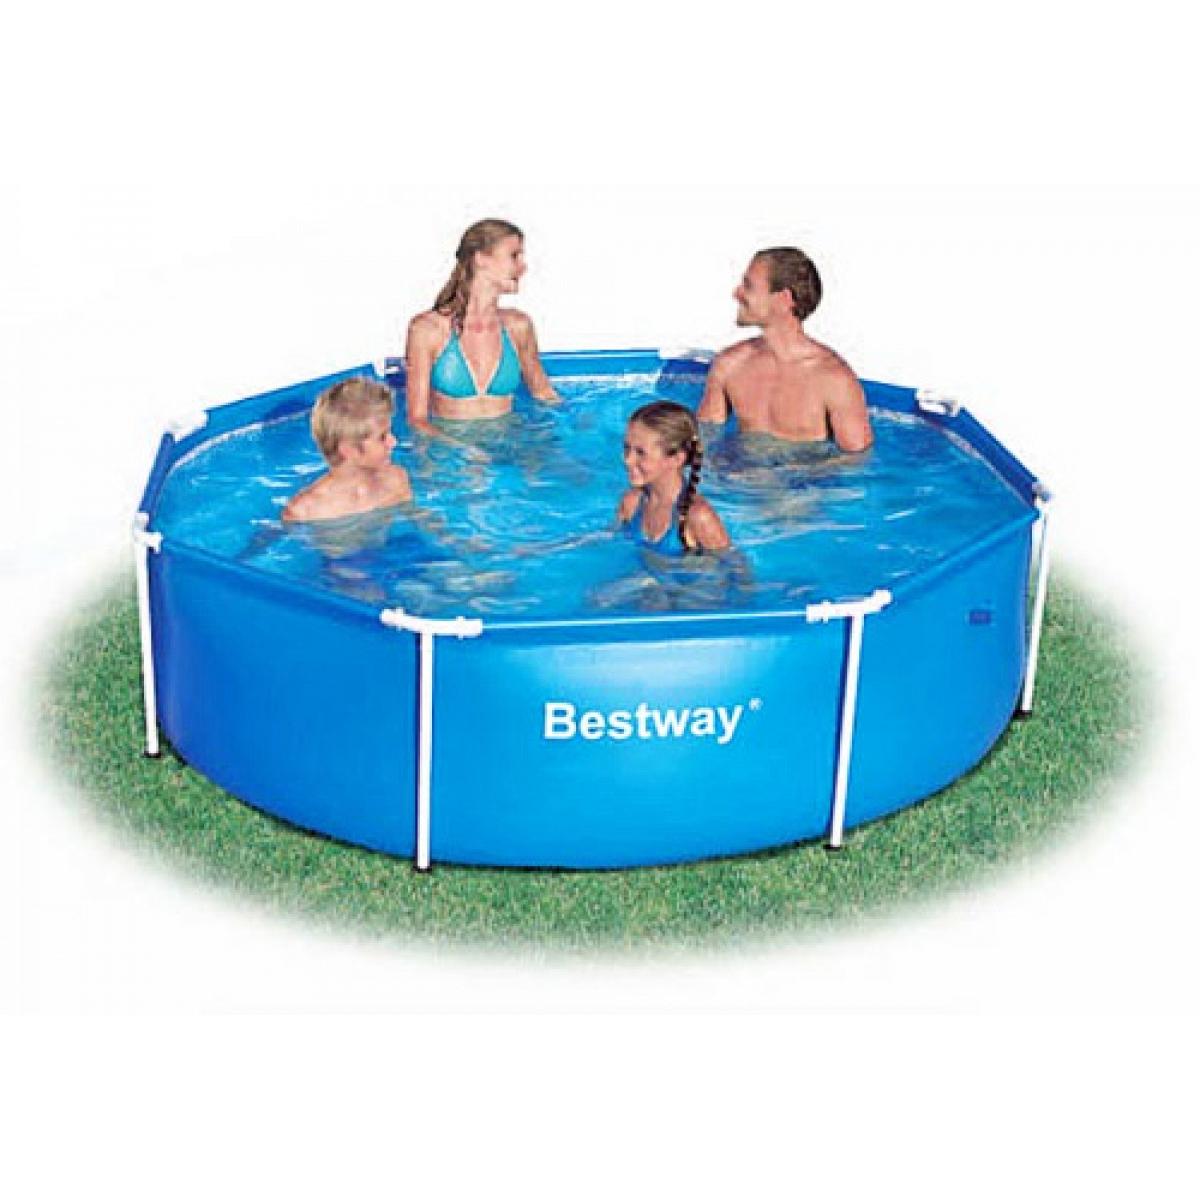 Round Pool Bestway 244x61 Mod Steel Pro Bestway Above